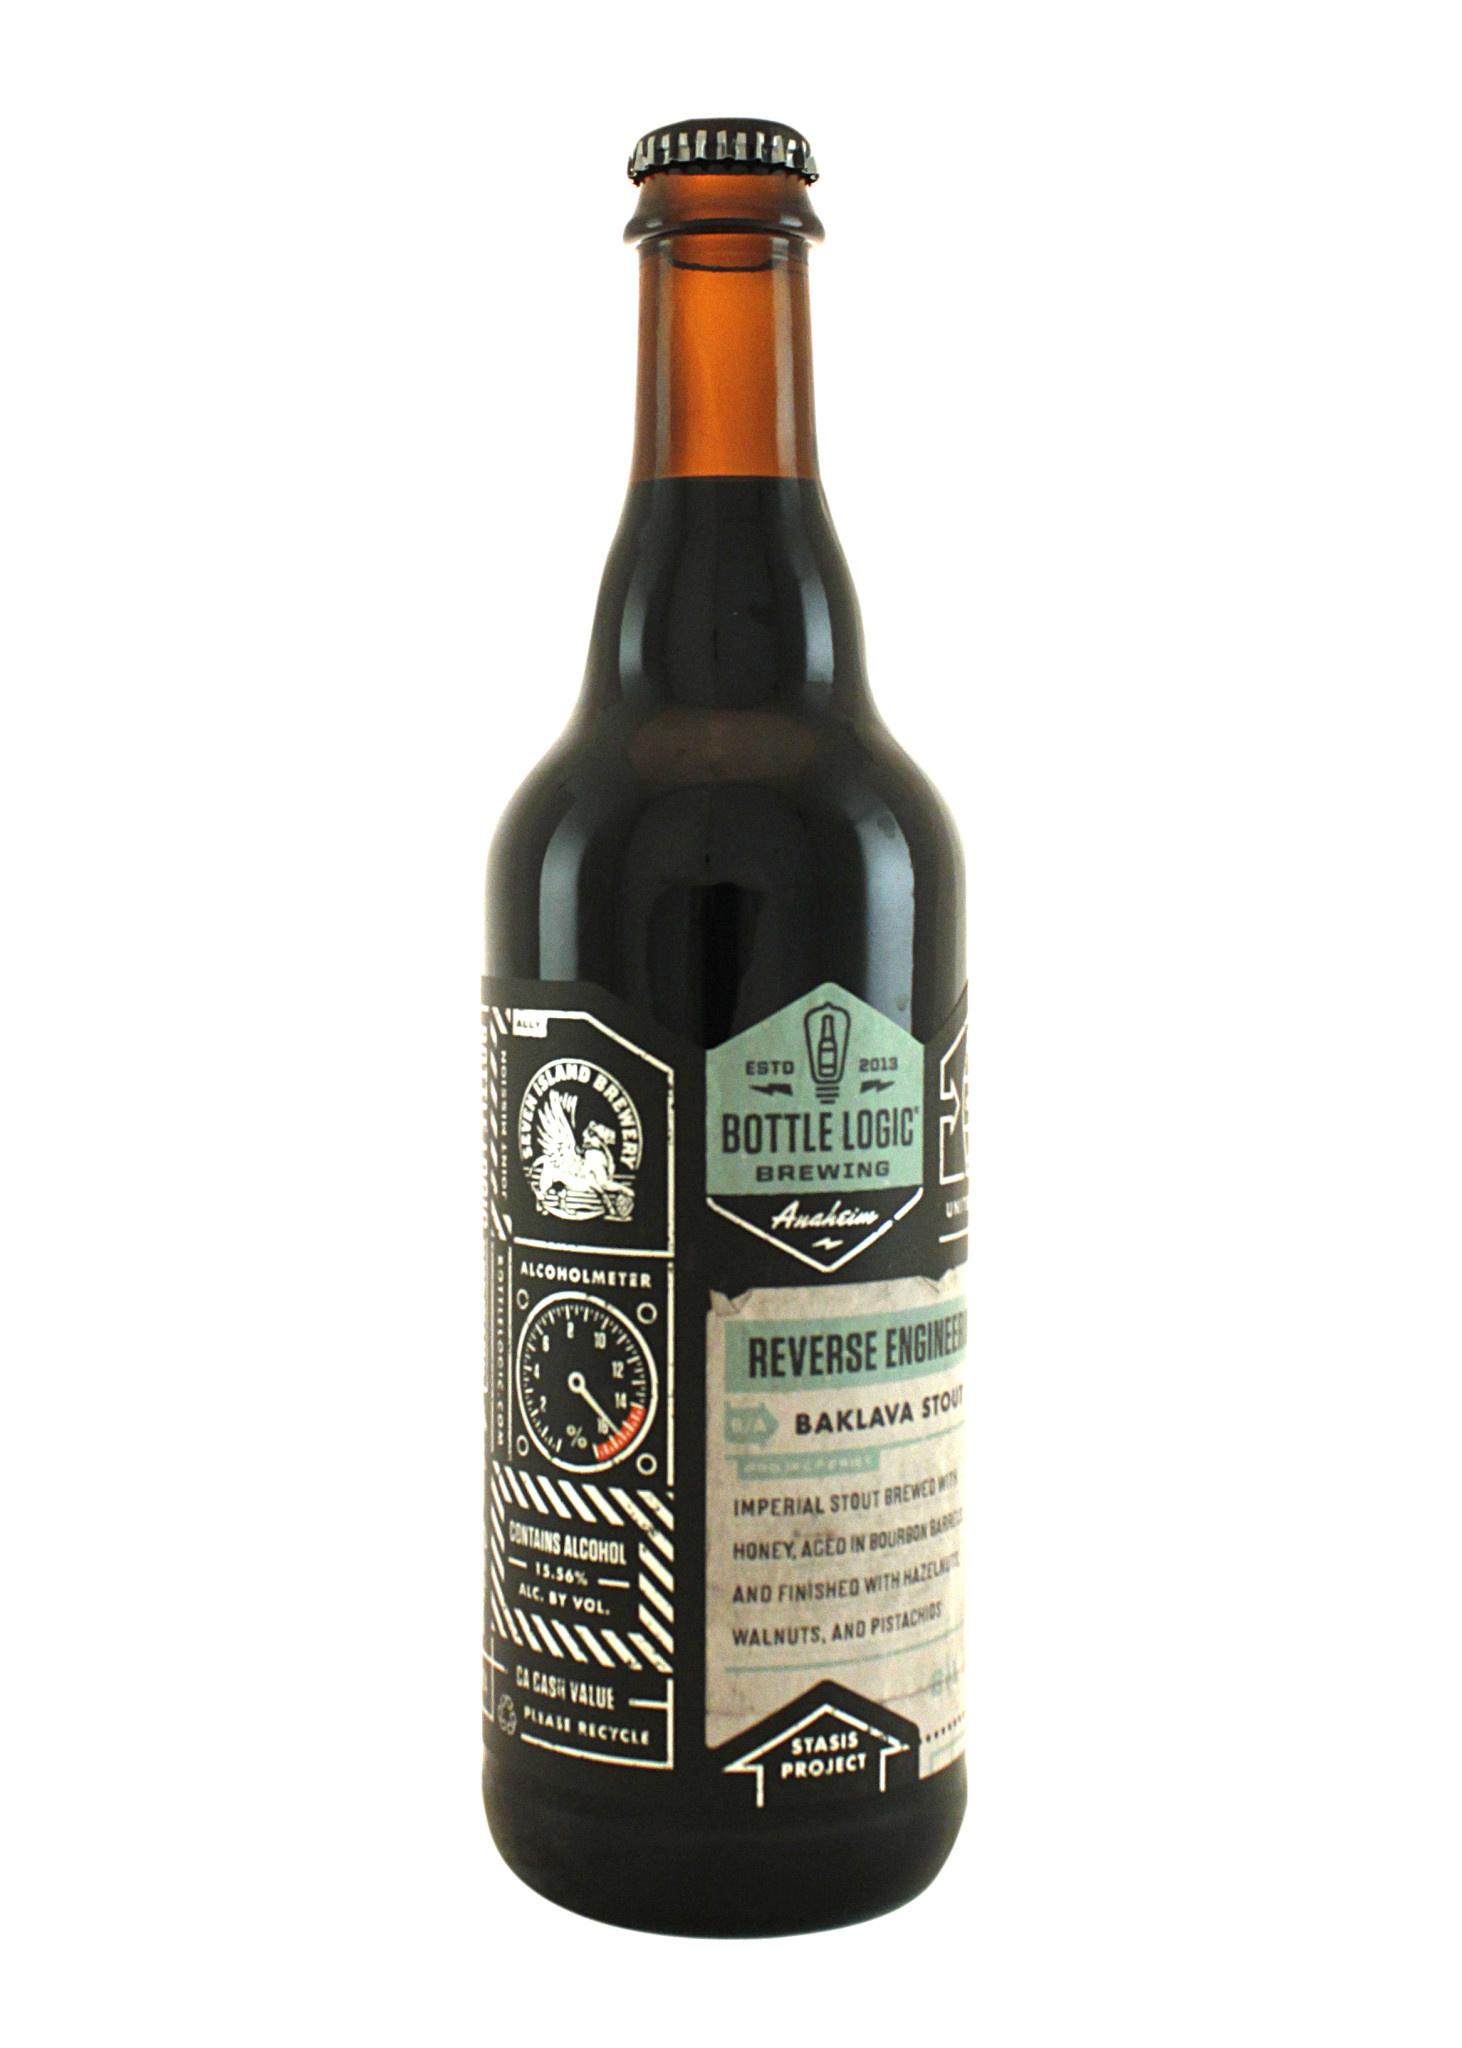 "Bottle Logic Brewing ""Reverse Engineering"" Baklava Stout 500ml. bottle - Anaheim, CA"